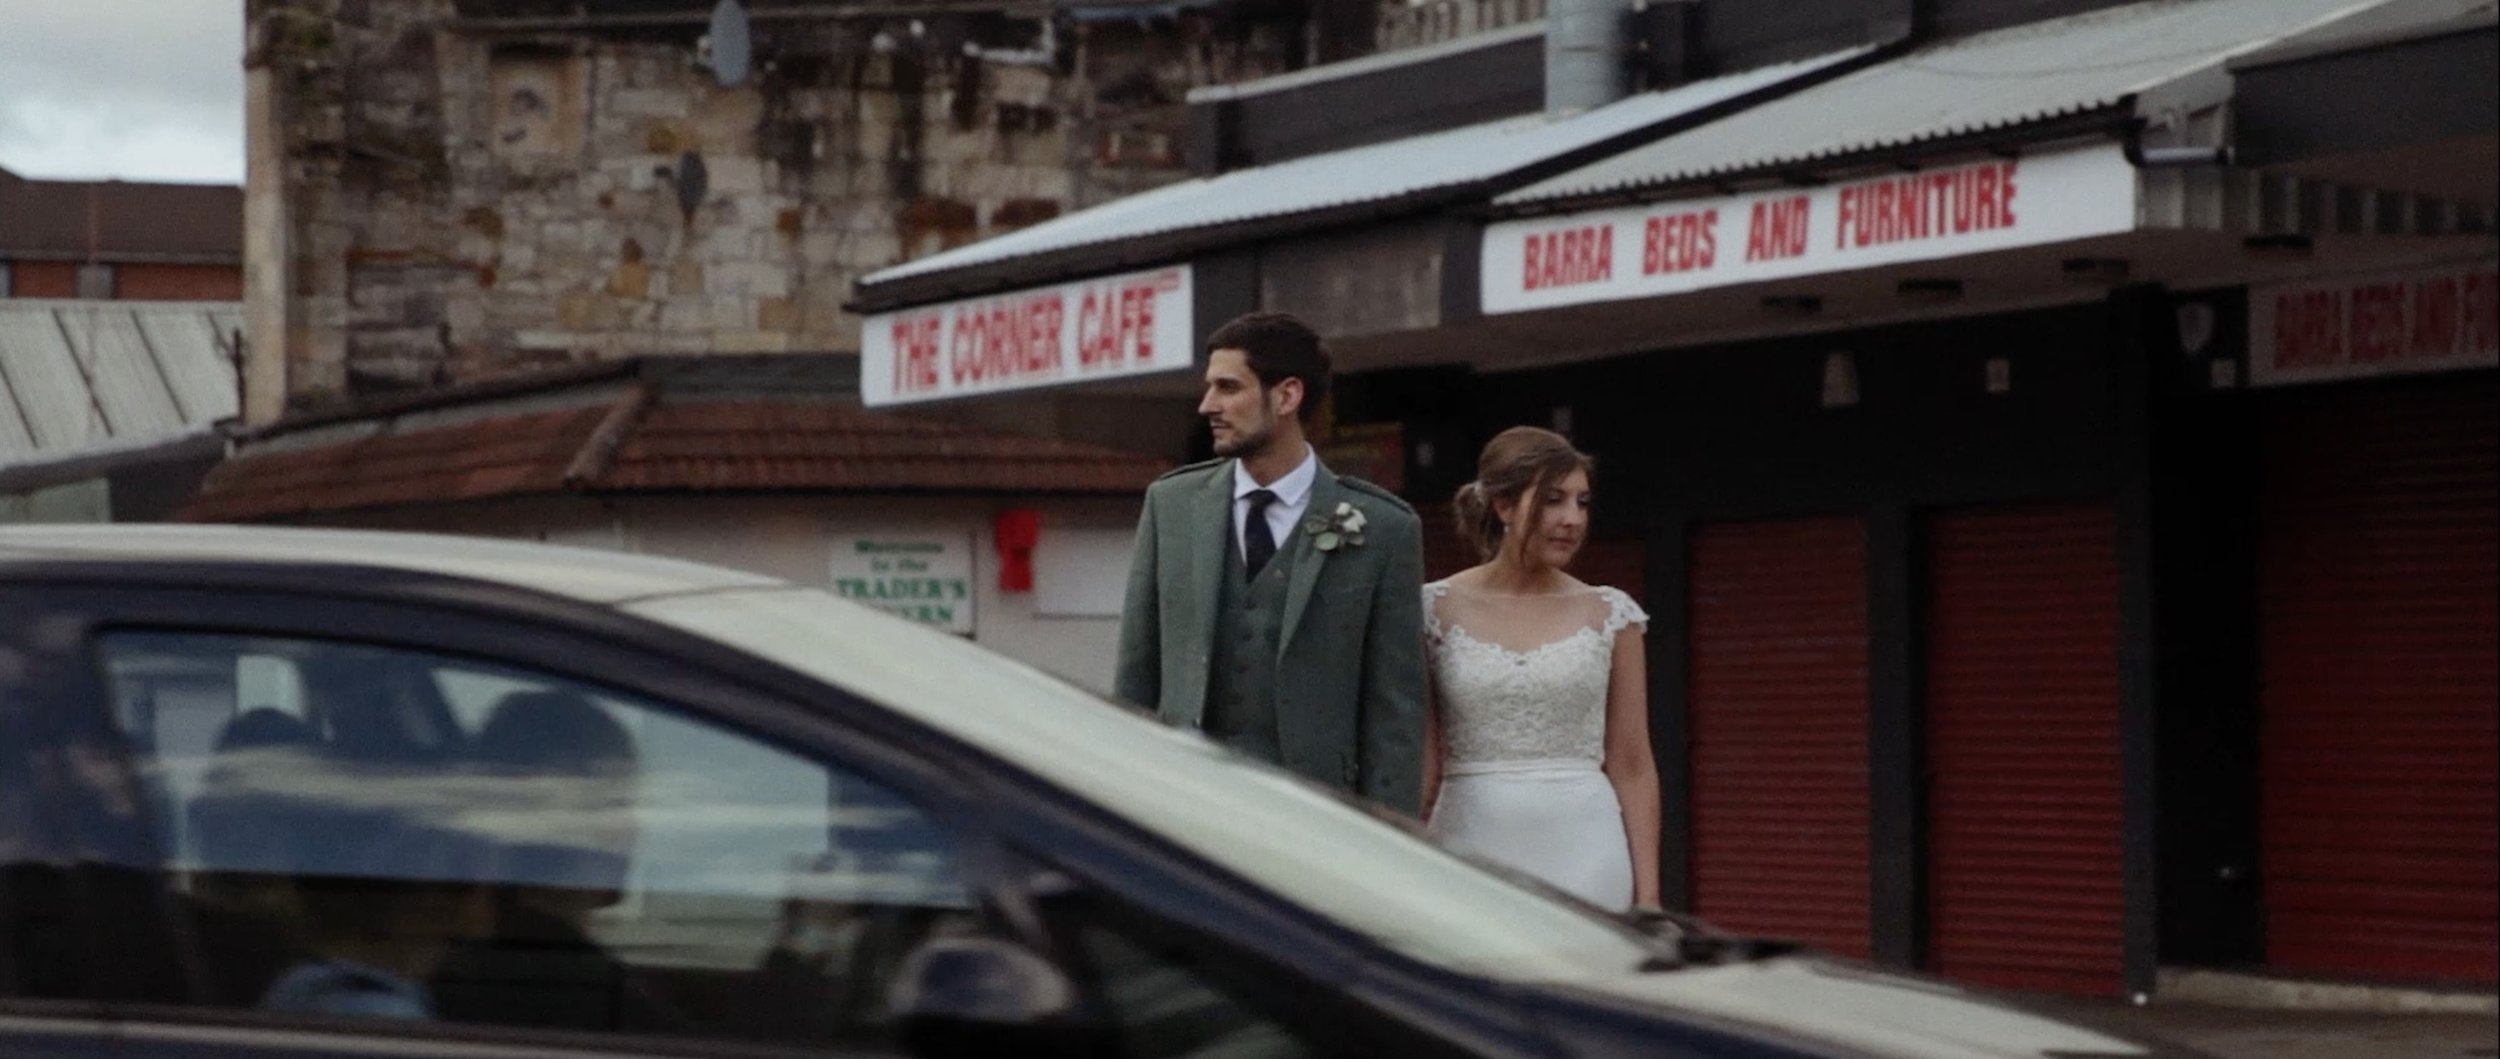 loch-lomond-wedding-videographer_LL_05.jpg